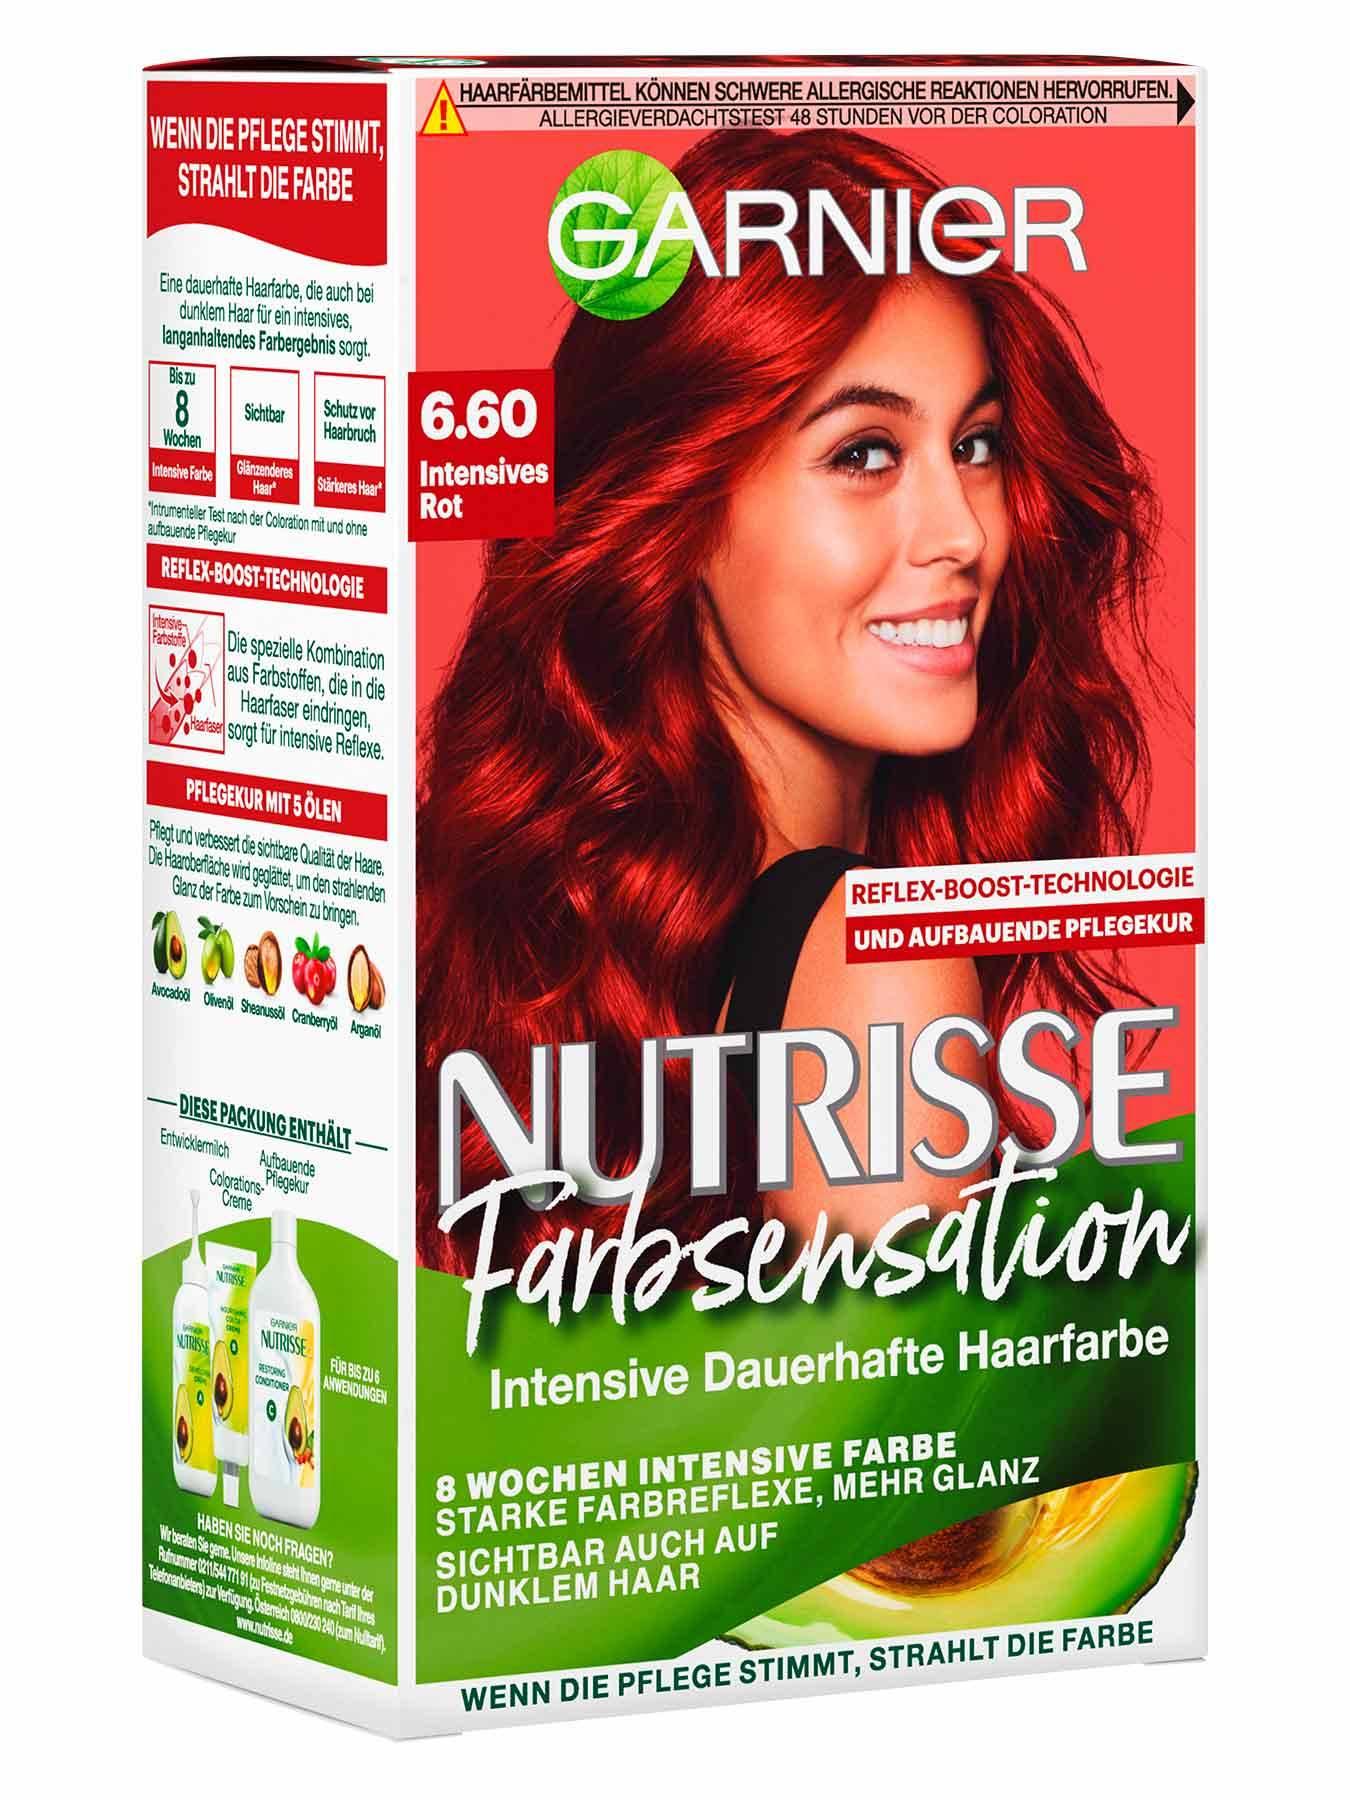 60 über haarfarbe frauen Rot (Haarfarbe)